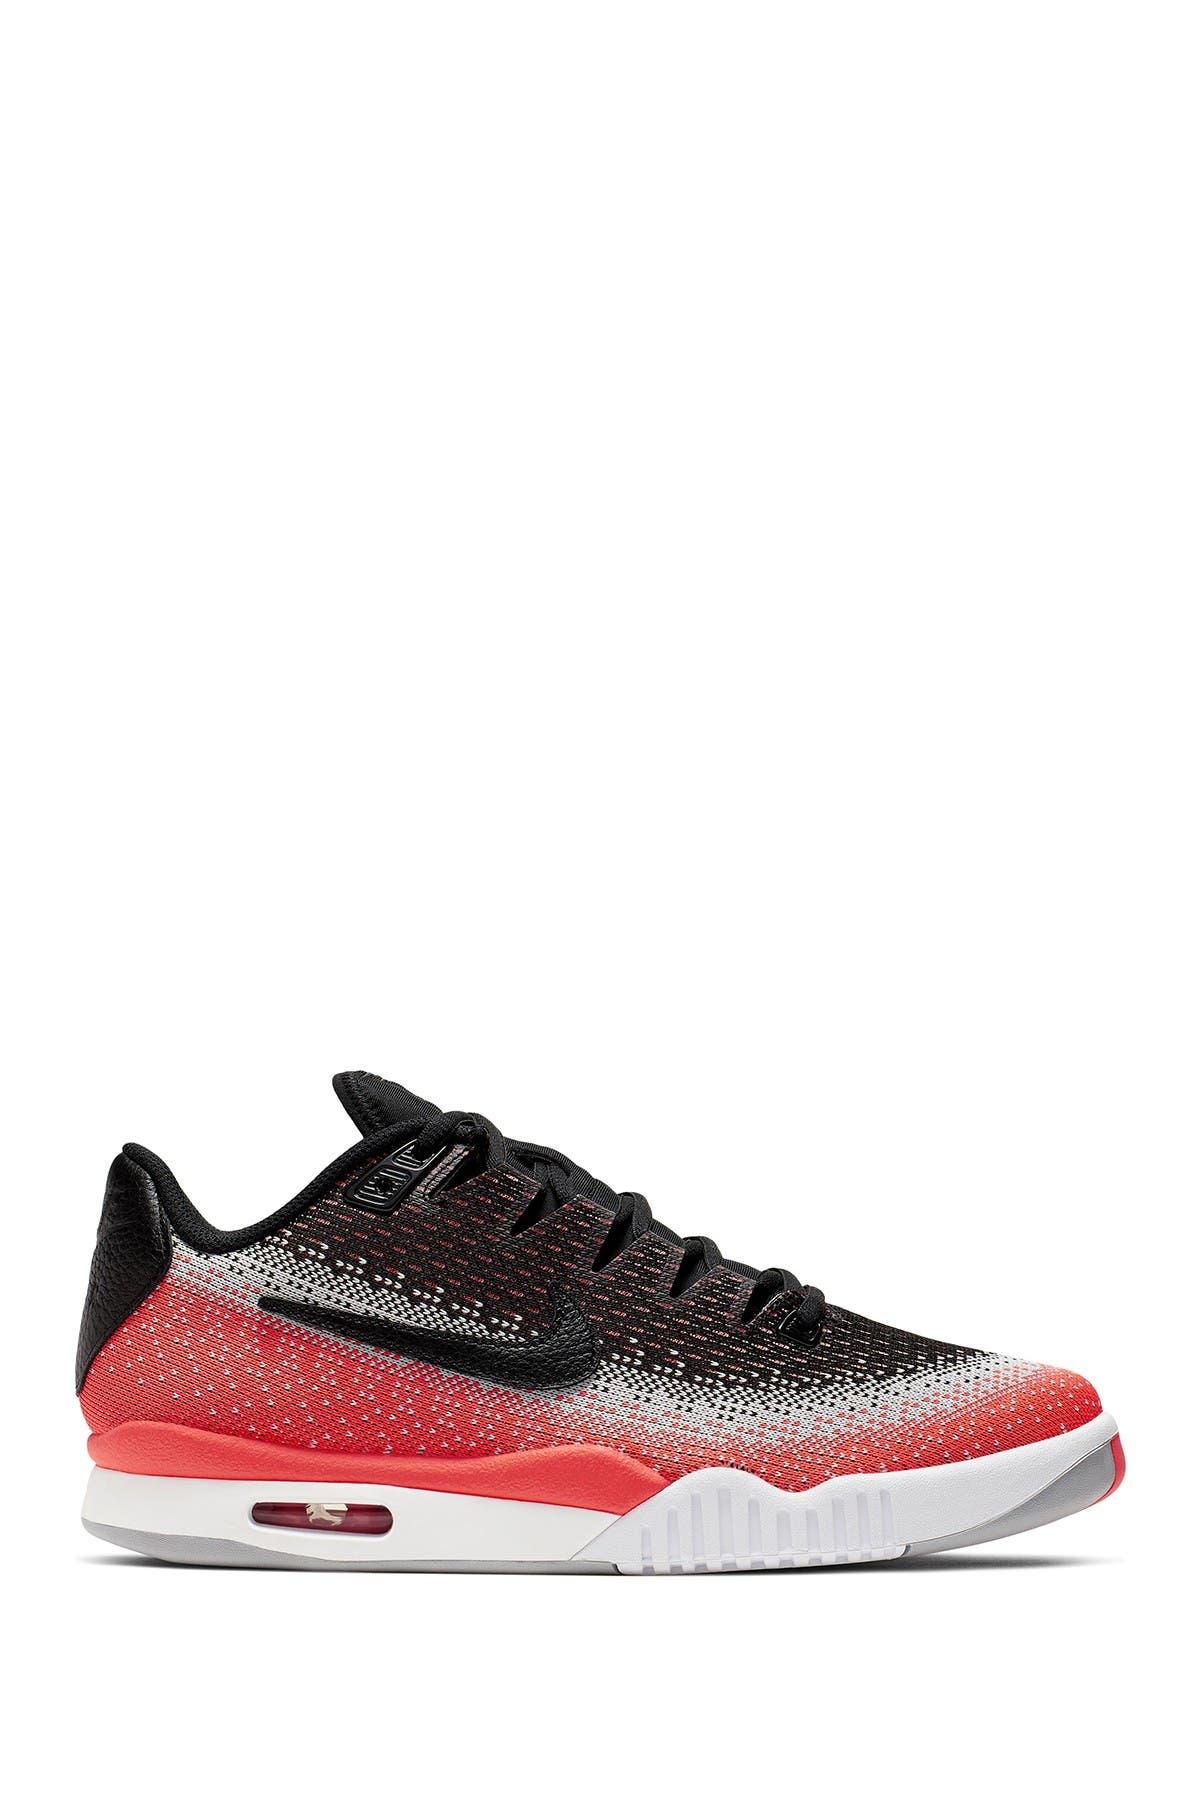 Nike   Court Vapor X TC Knit Tennis